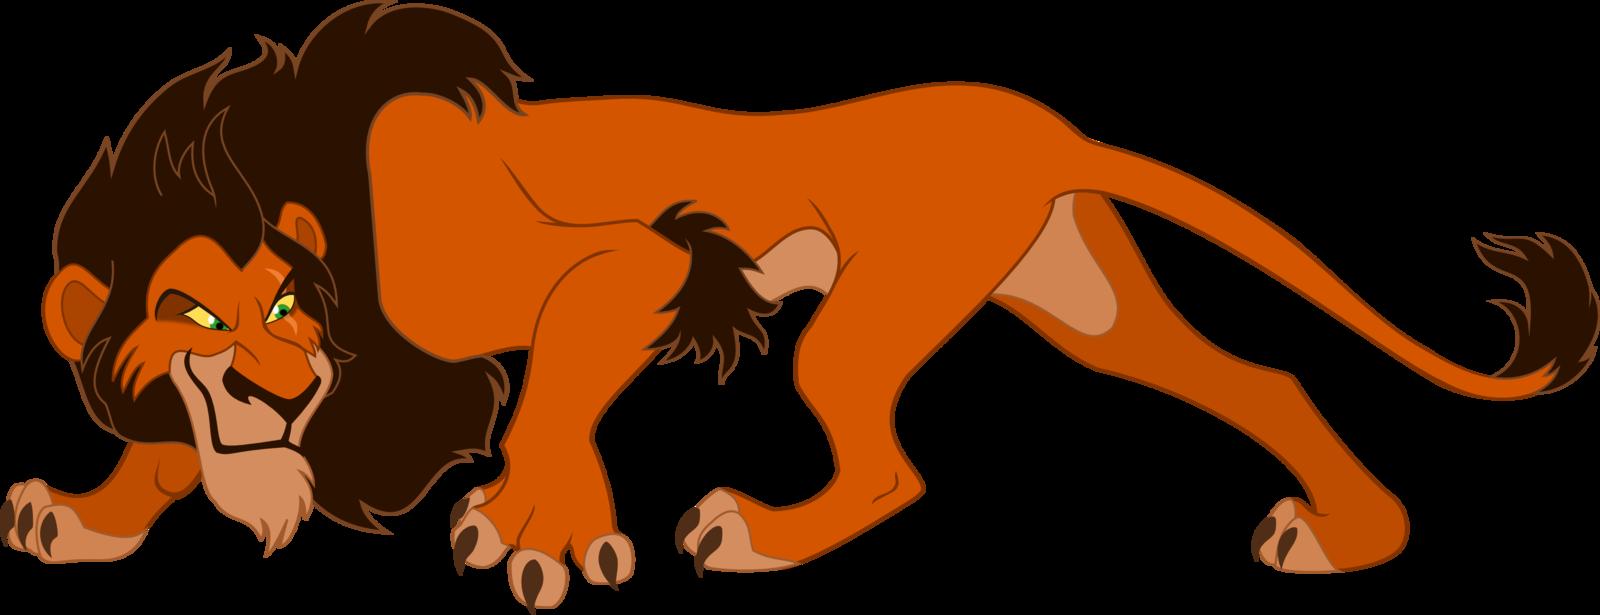 King scar image purepng. Clipart png lion